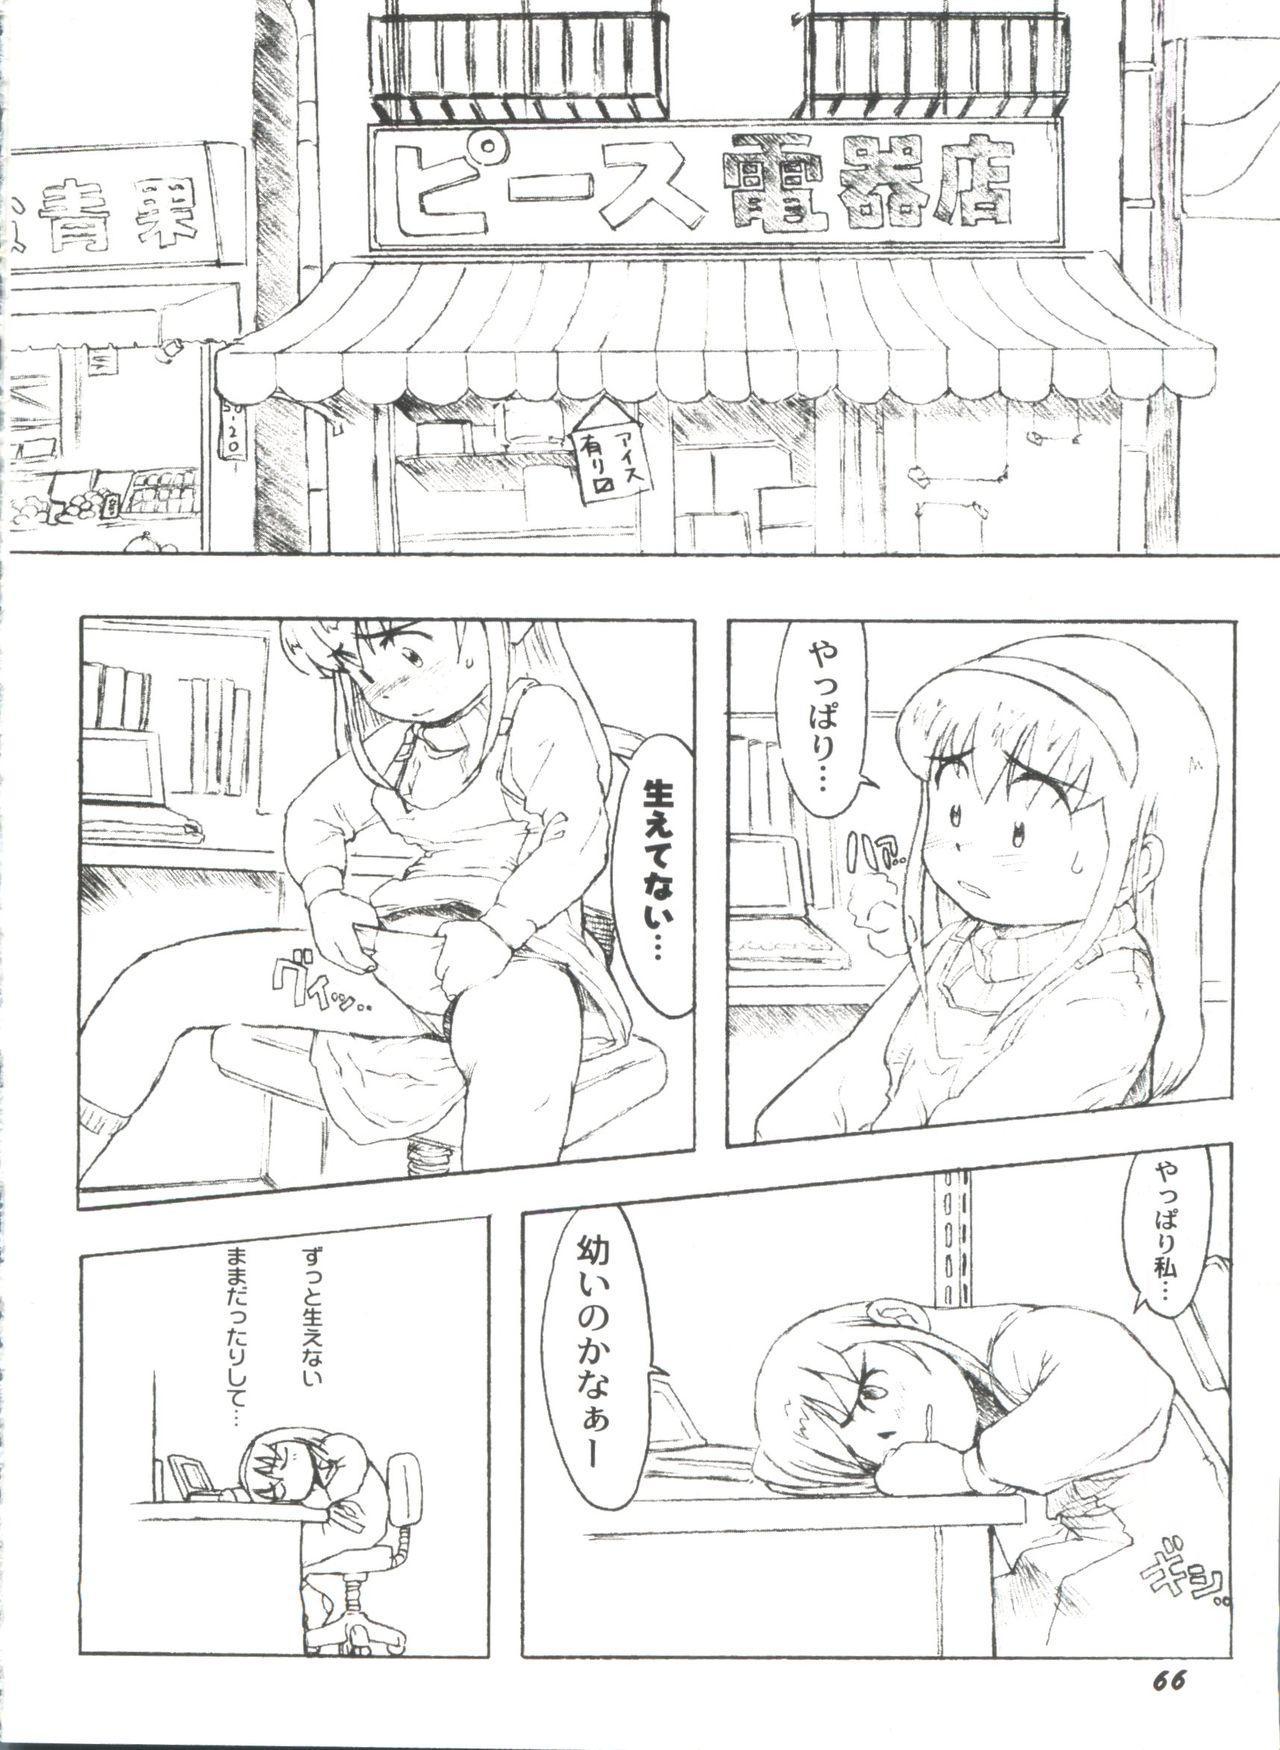 [Anthology] Denei Tamatebako 8 - Utakata no Tenshi-tachi II (Various) 67